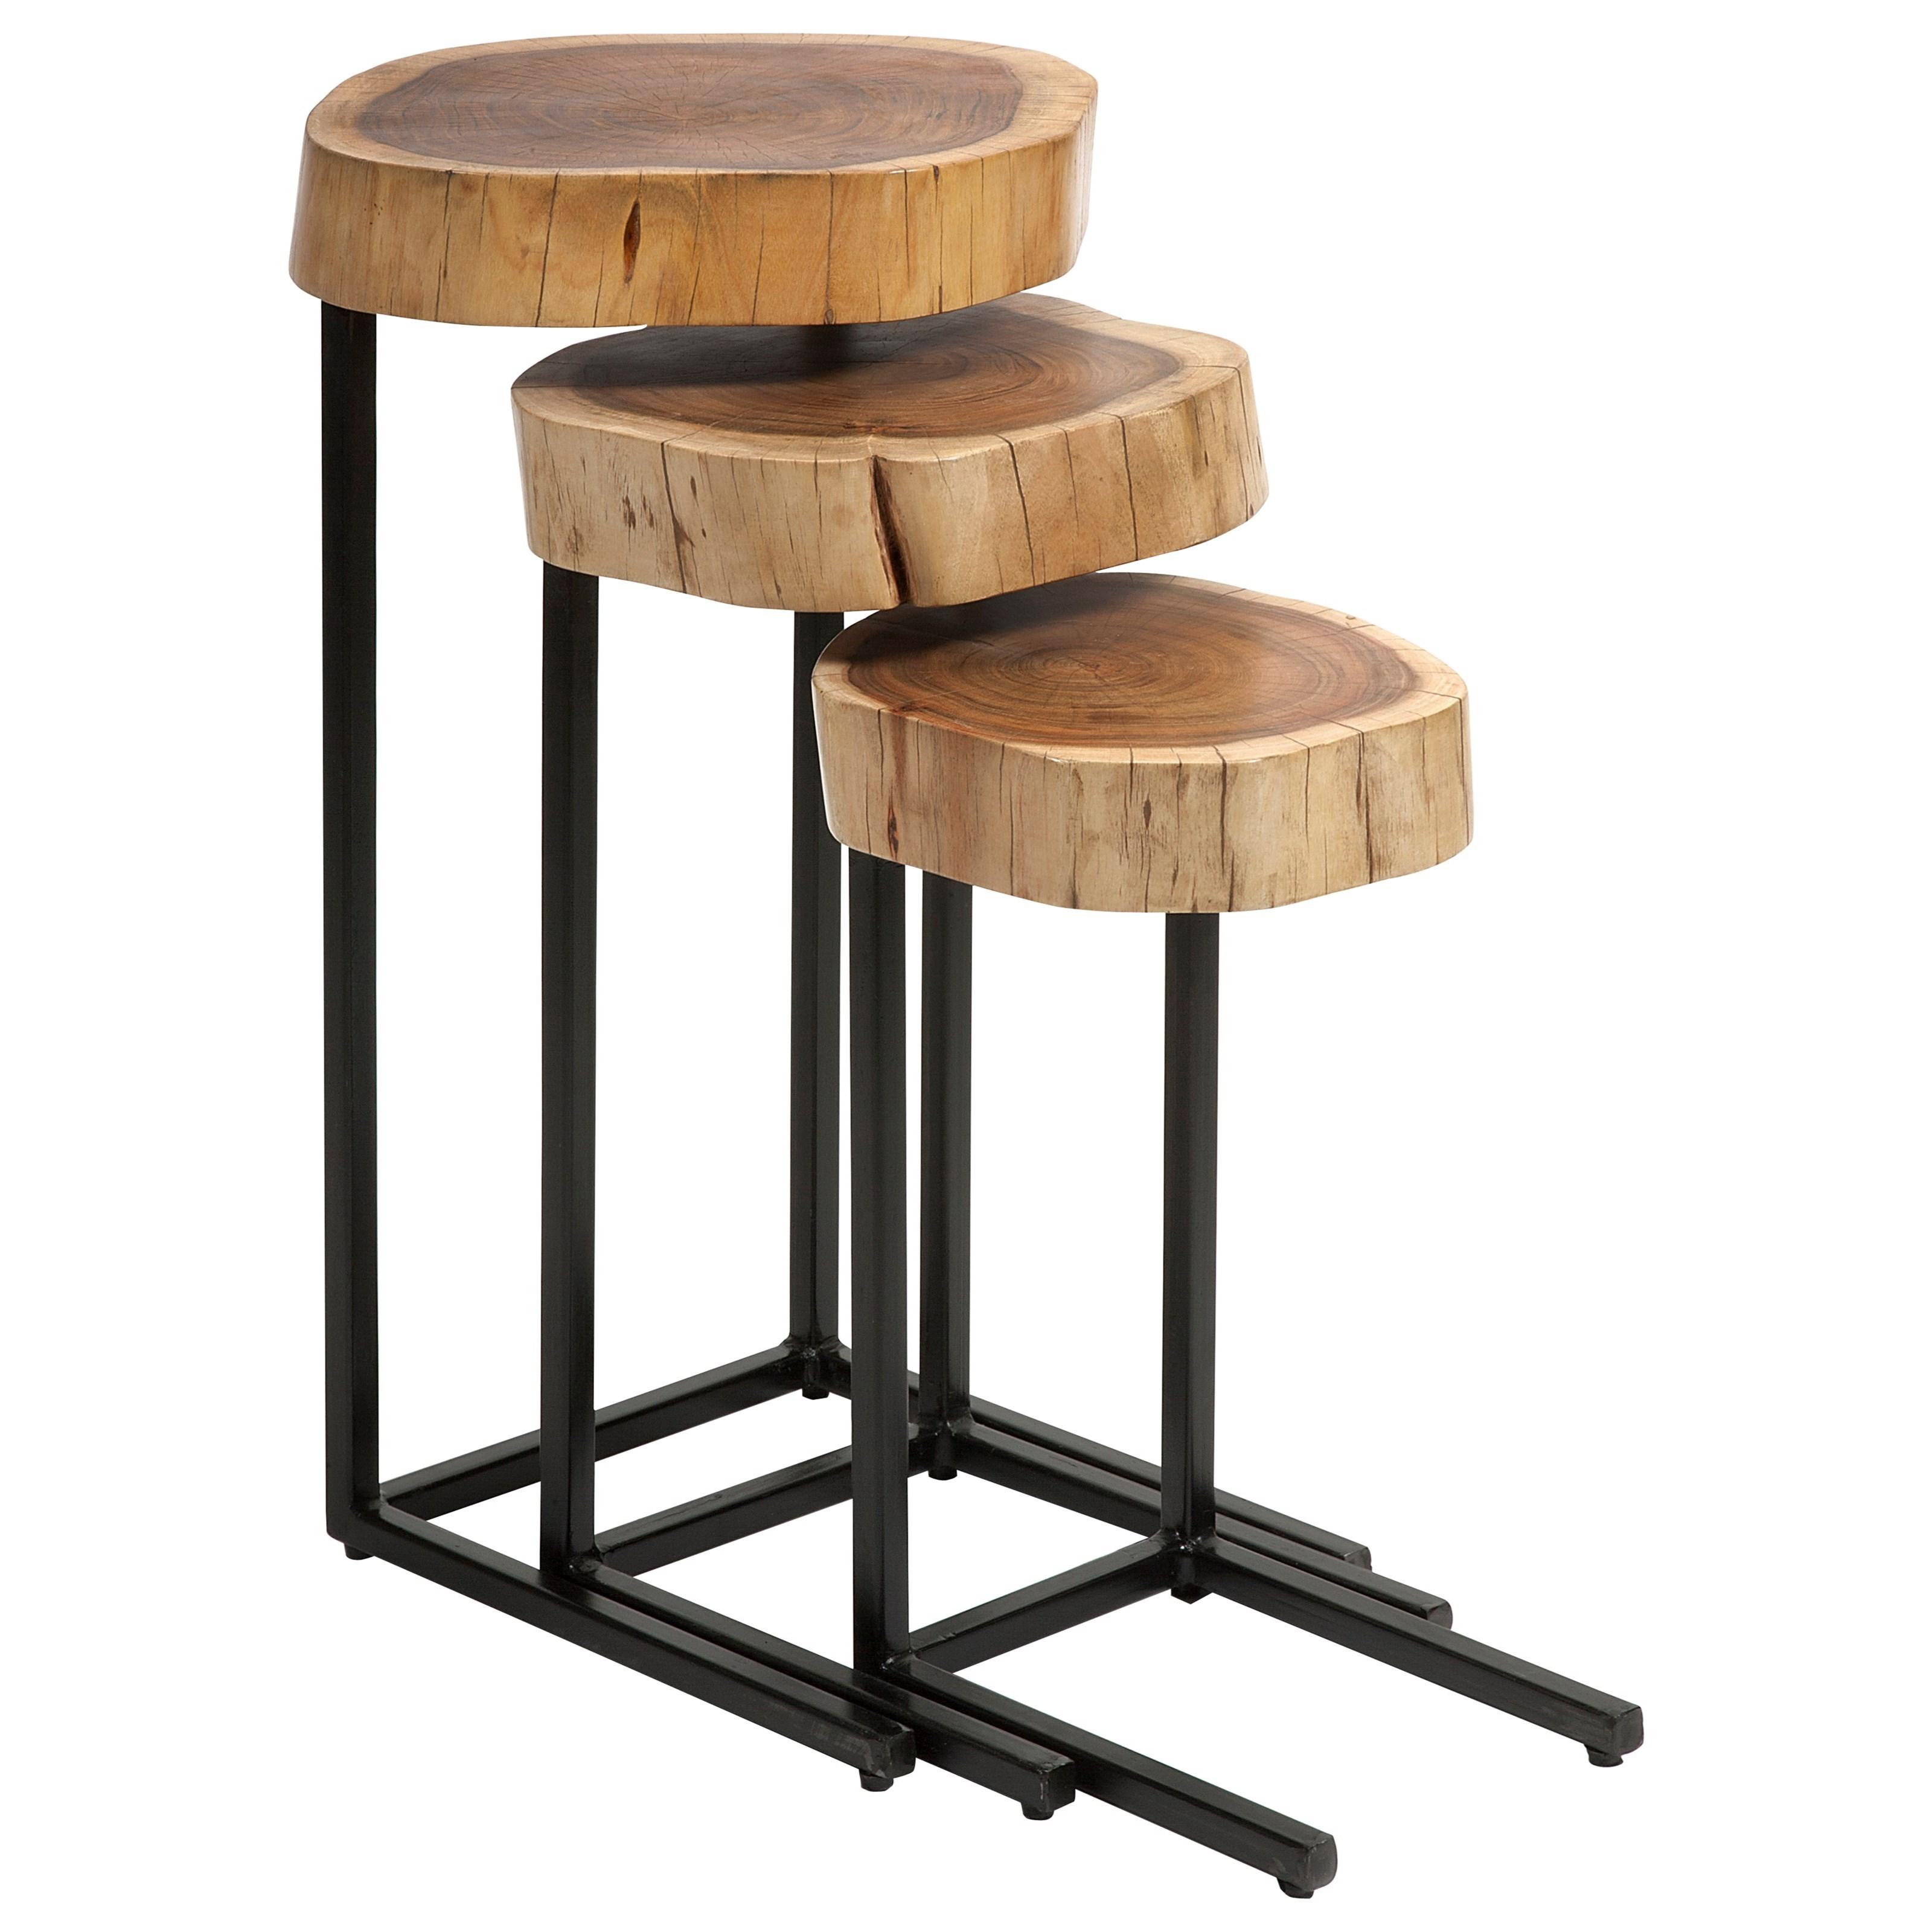 Nadera Wood and Iron Nesting Tables - Set of